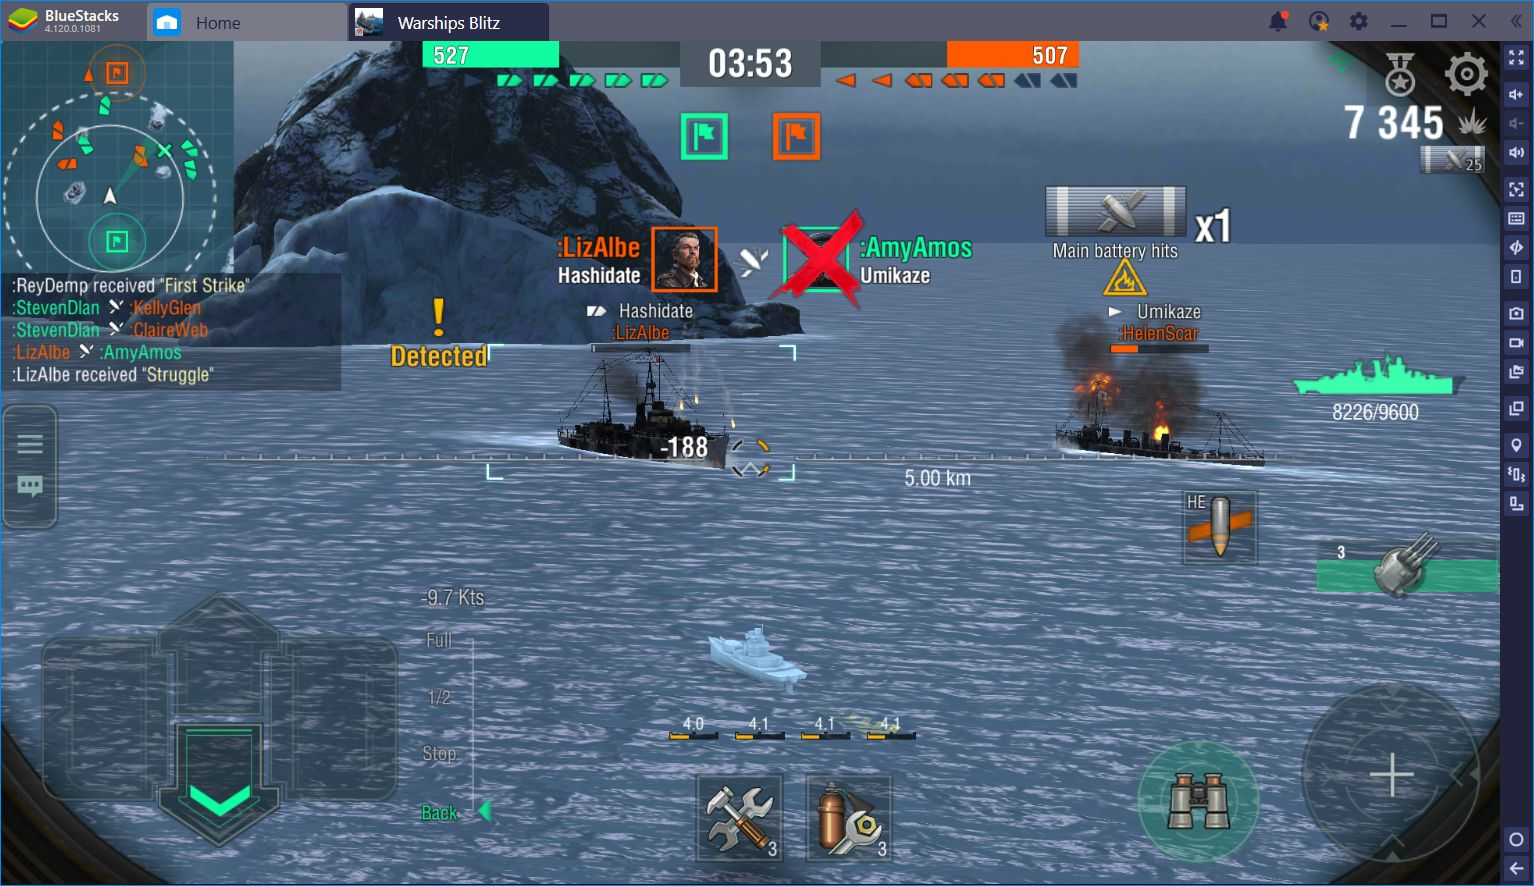 World of Warships Blitz on BlueStacks: The Best Navy Game?